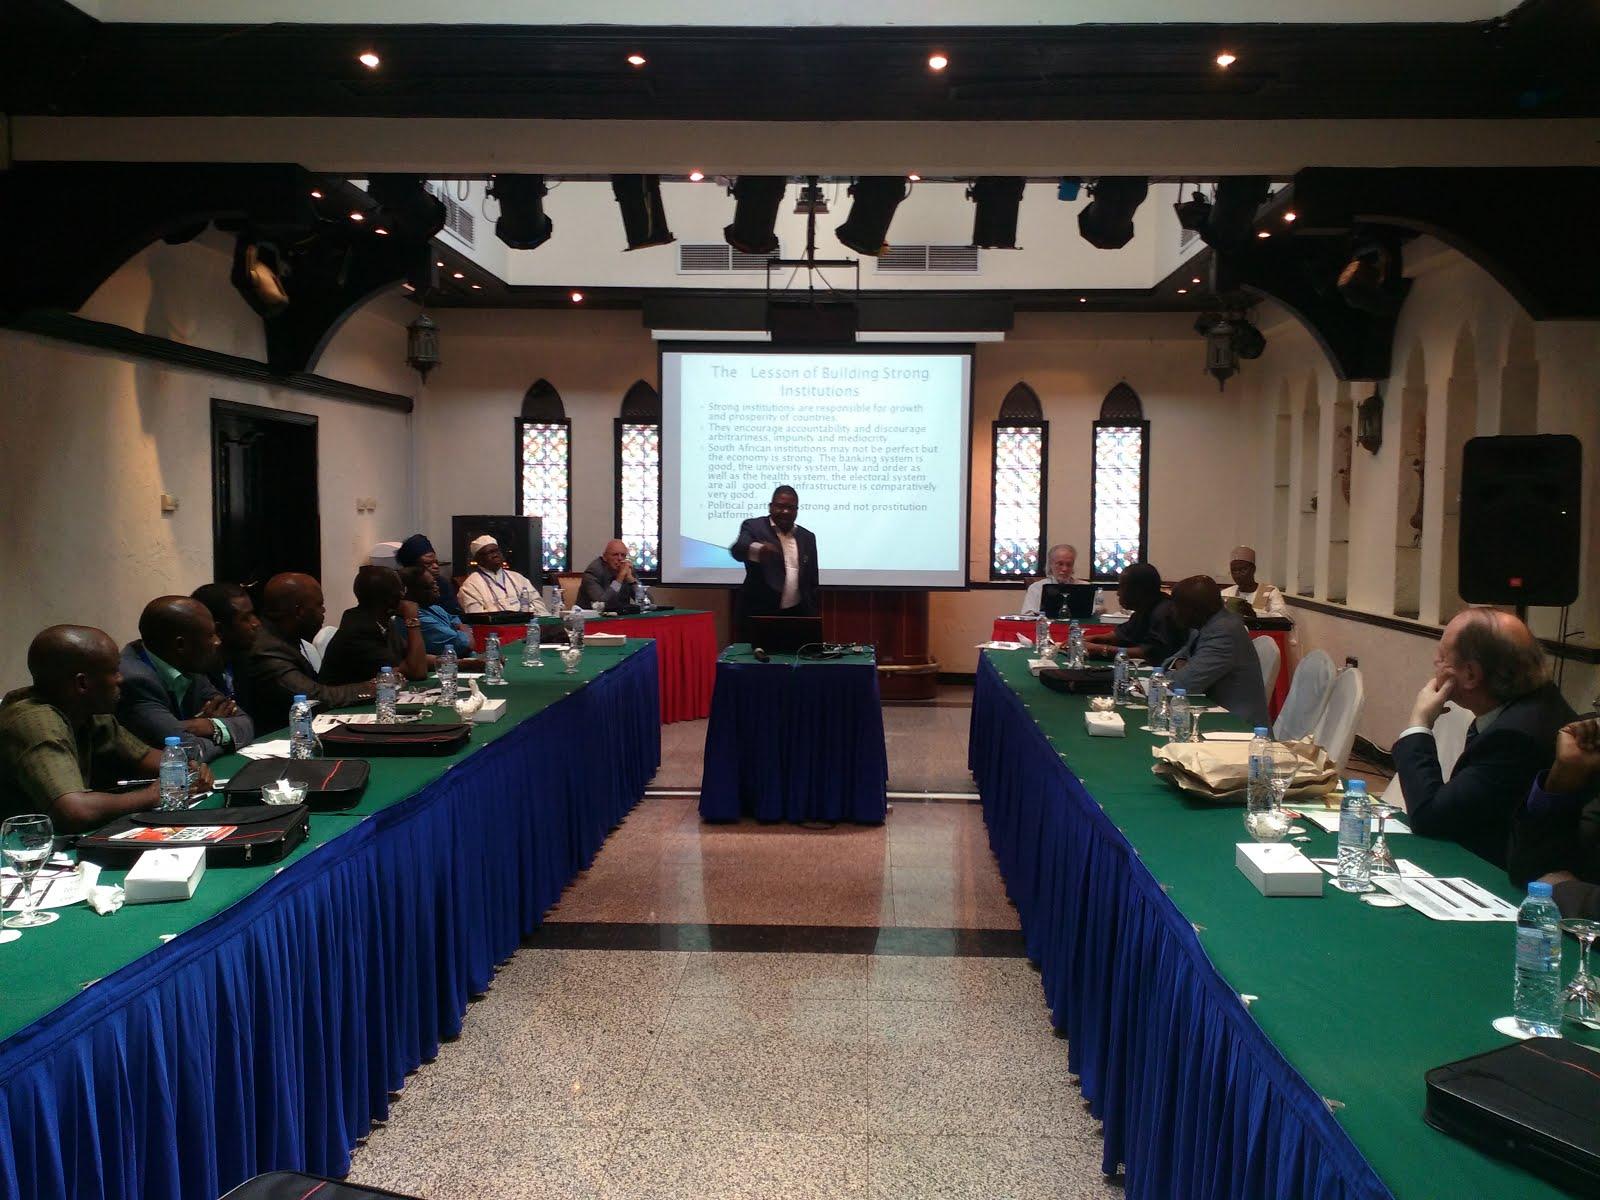 03/08/2015 St Clements dubai leadership conference